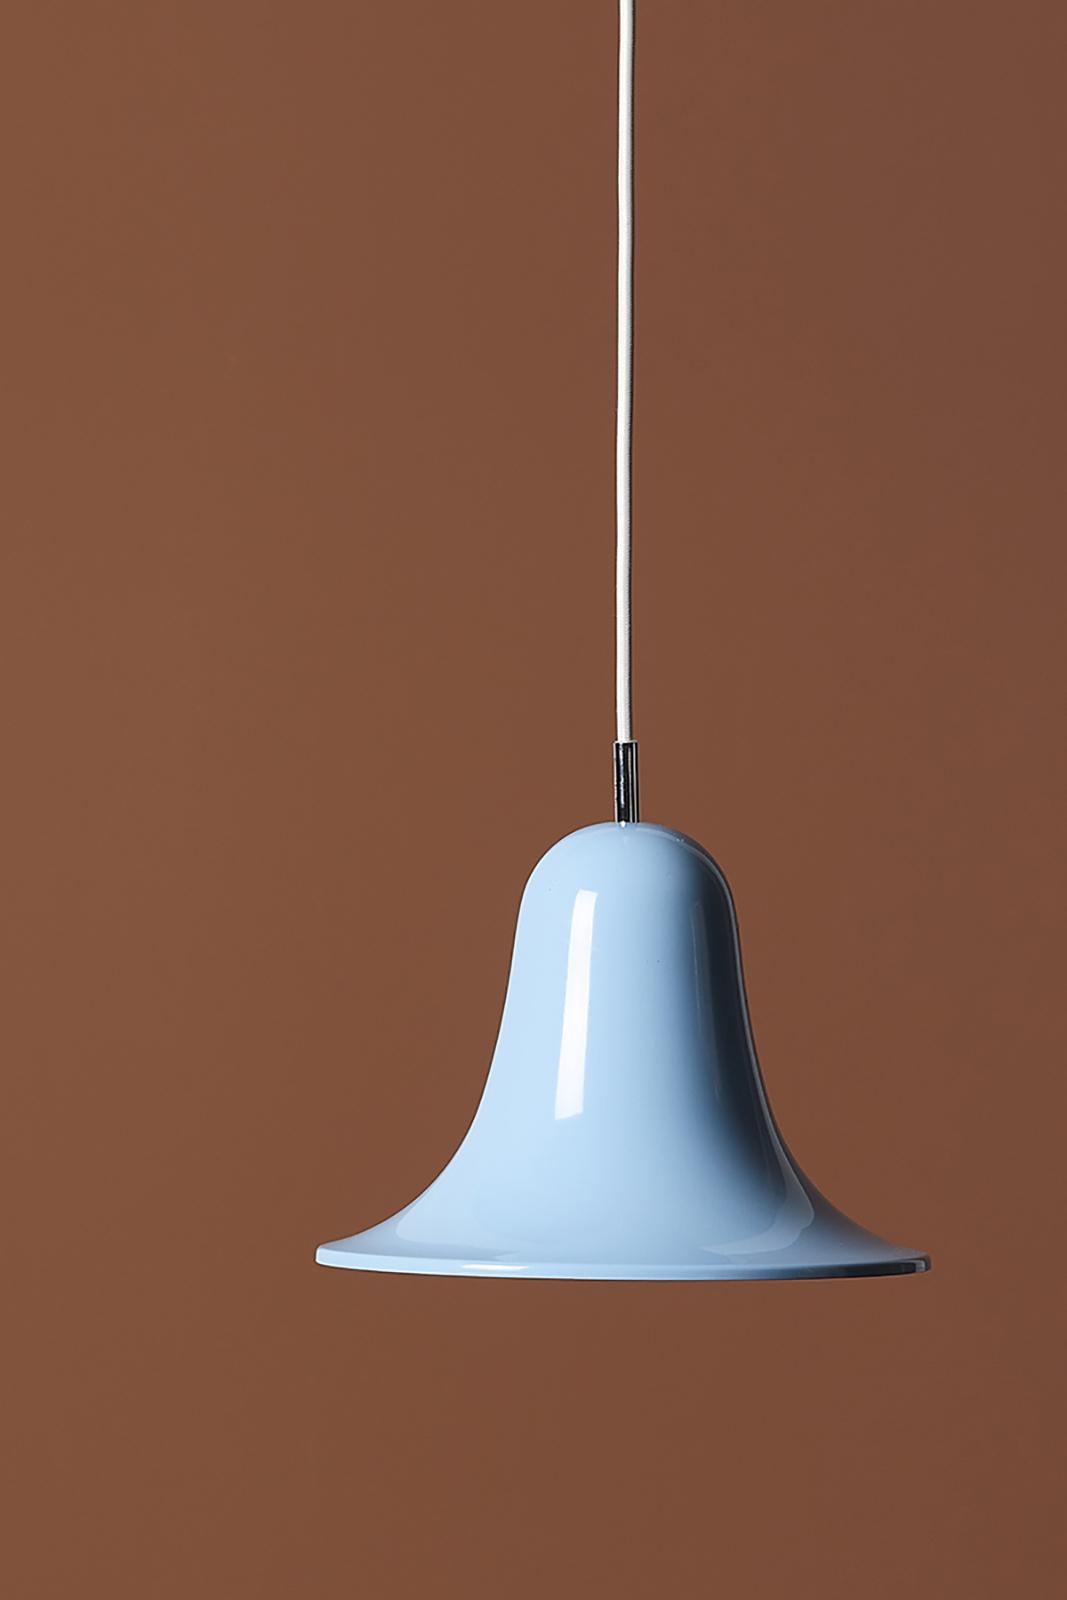 Verner Panton Pantop pendel, 23 cm, light blue